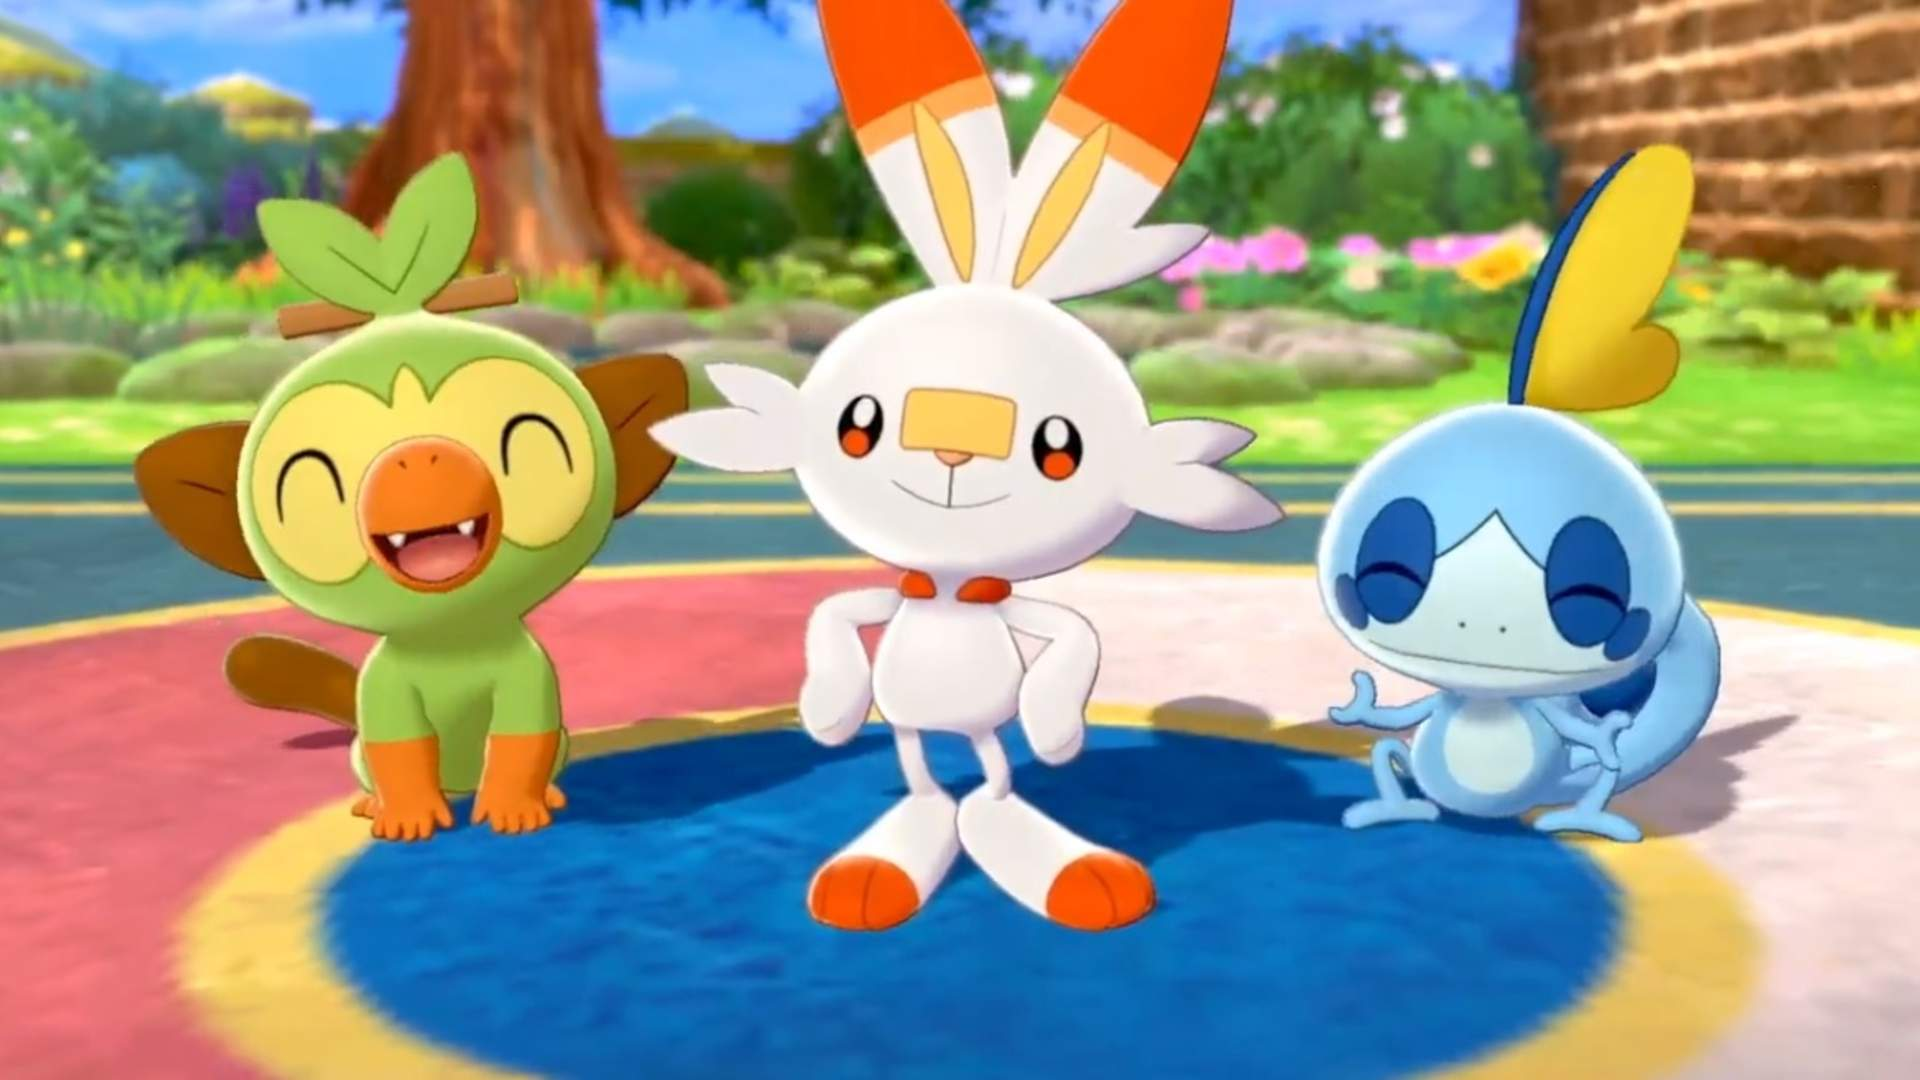 Pokémon: The Crown Tundra